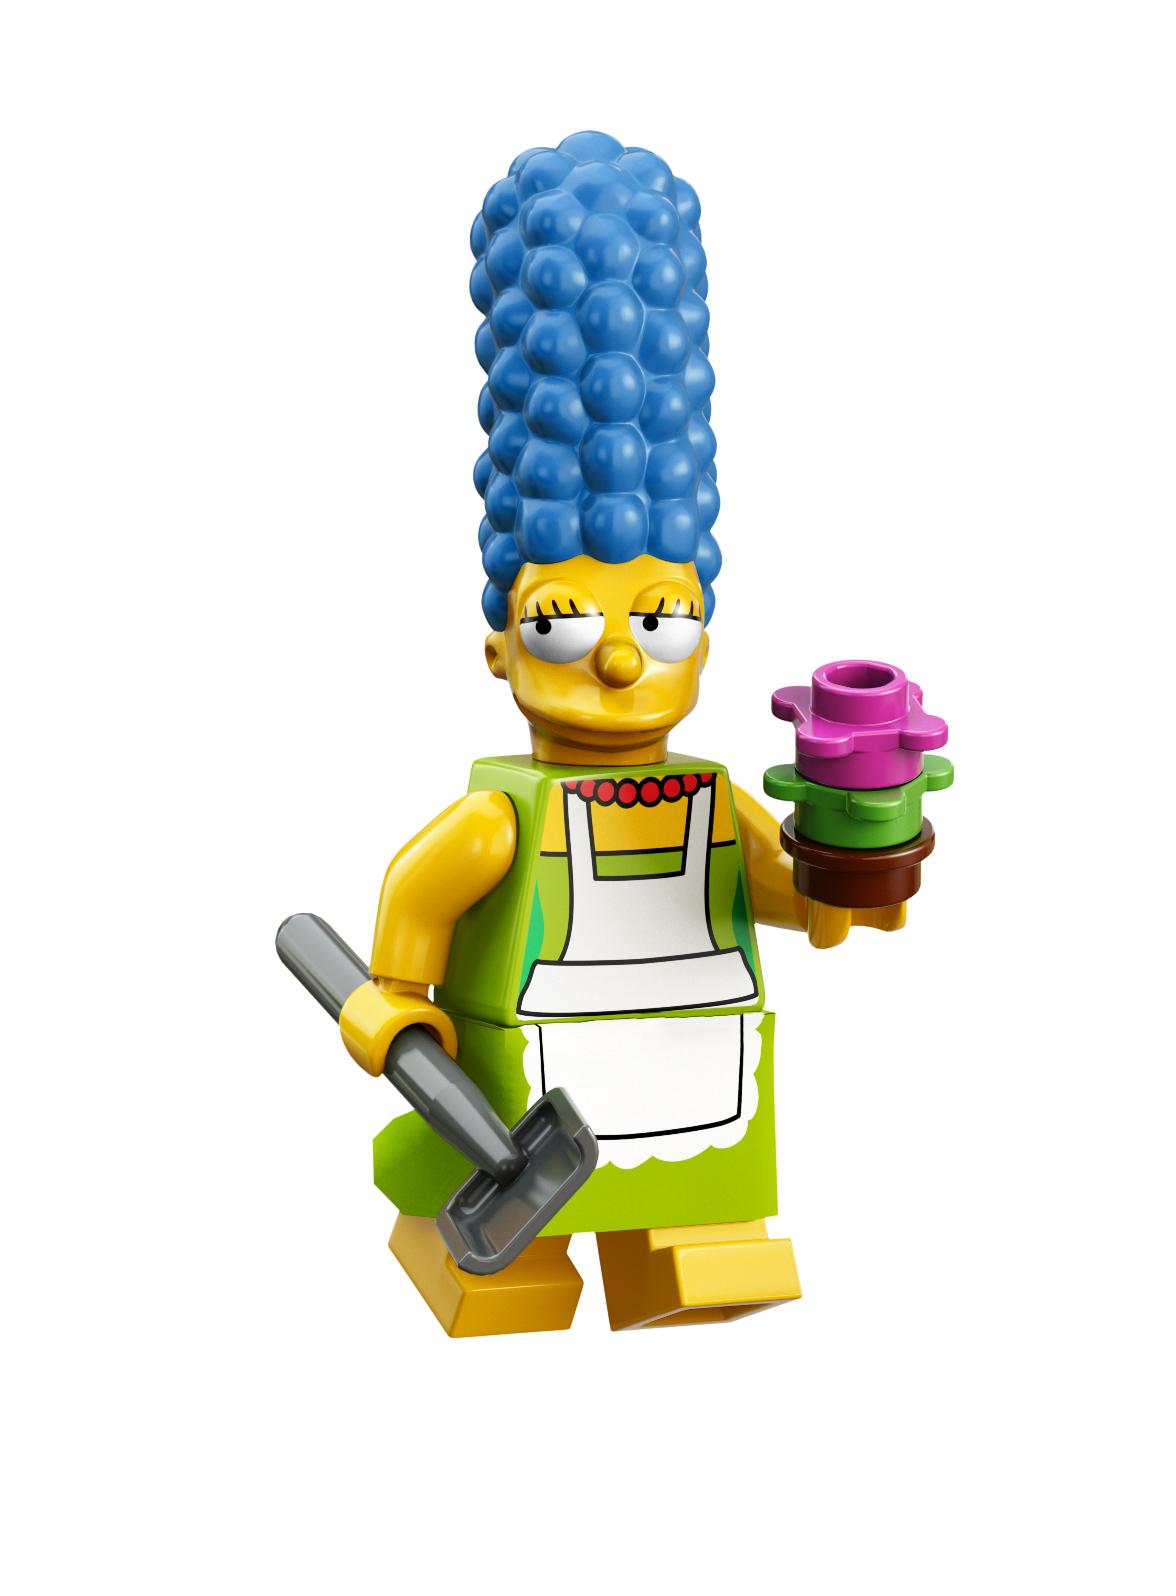 Maison-Lego-Simpsons-040